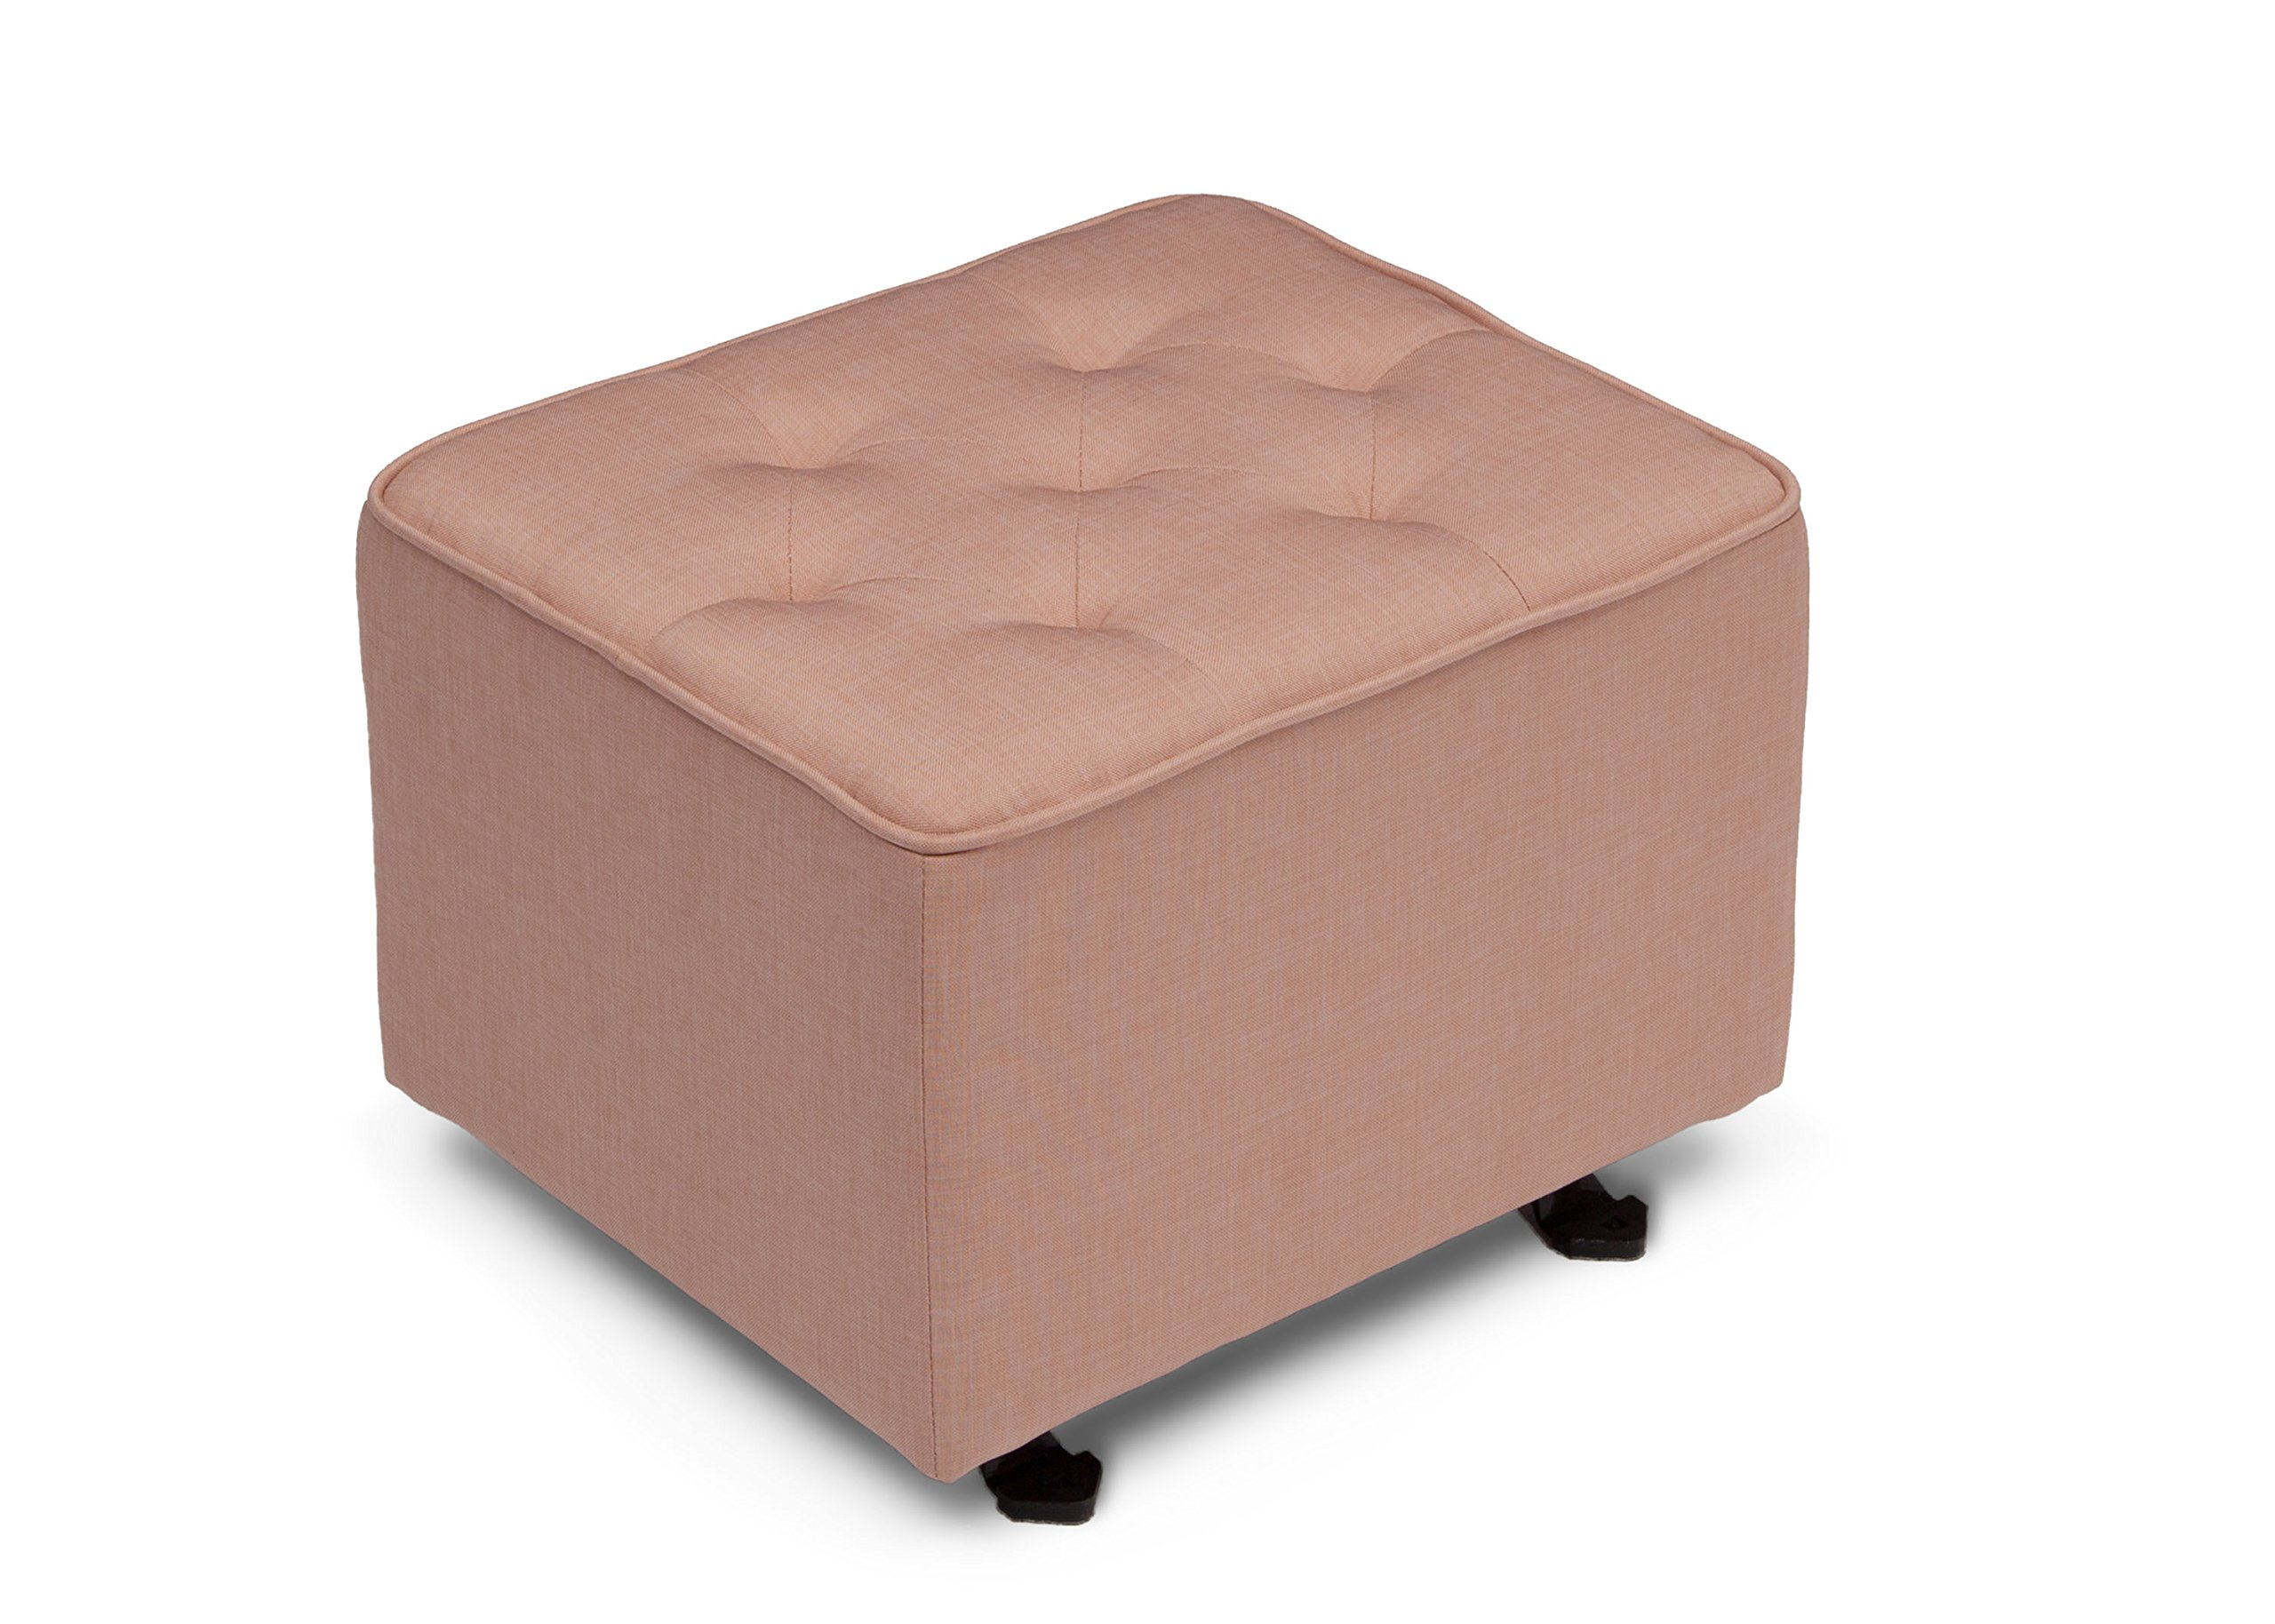 Amazon.com: Delta Furniture Middleton Upholstered Glider Swivel ...